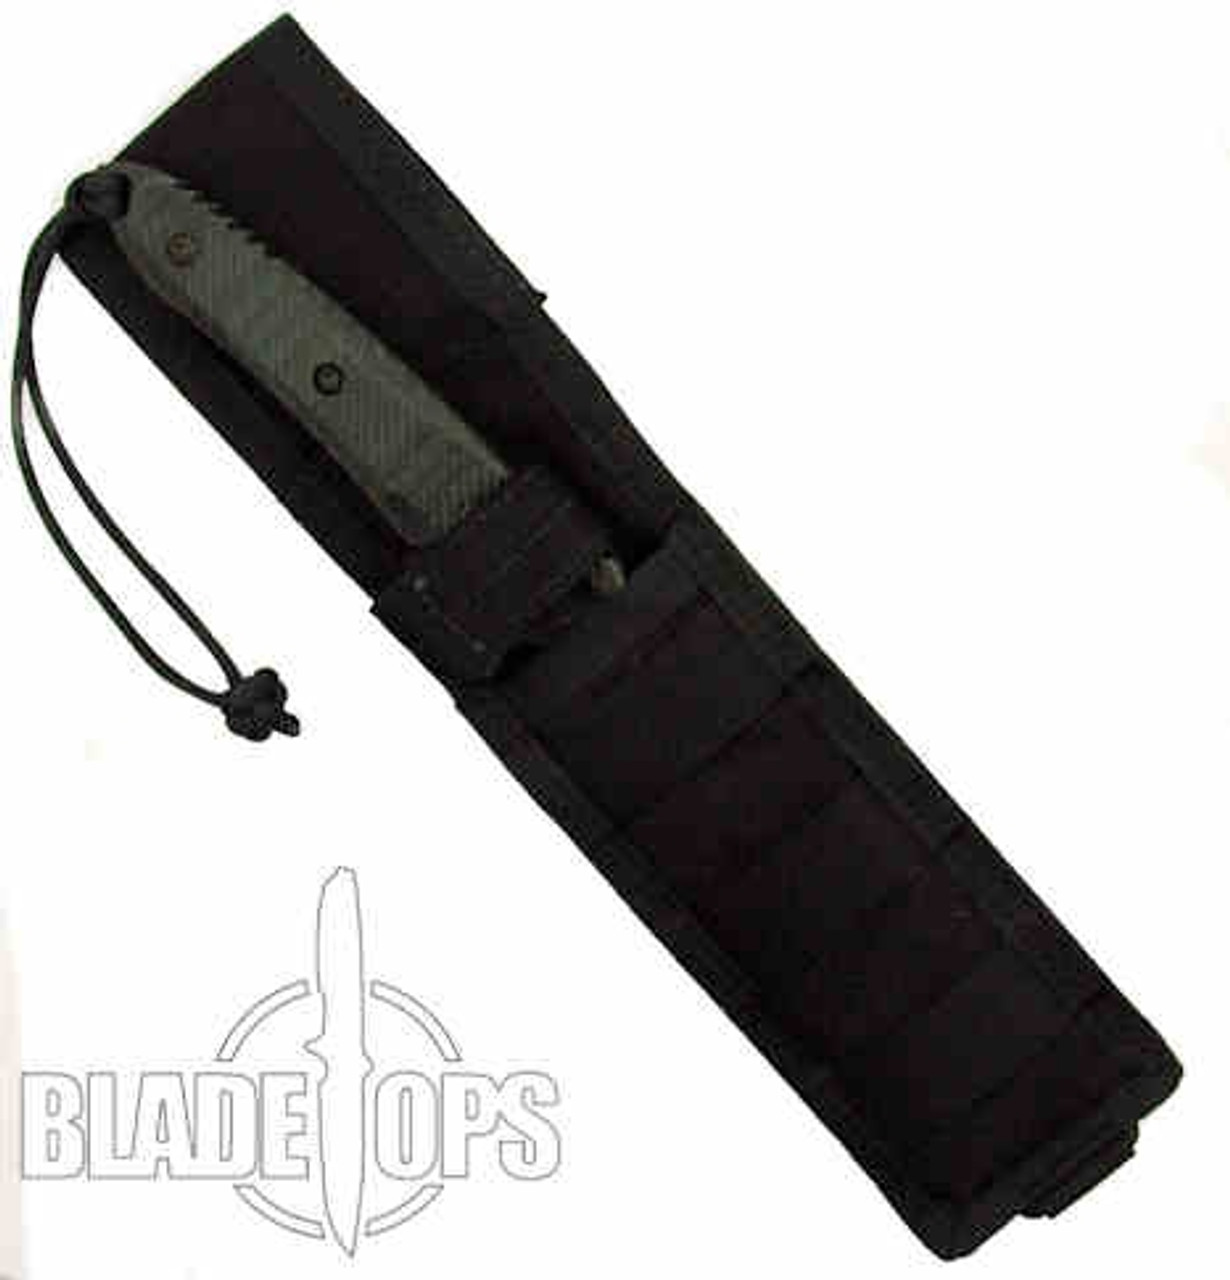 Spartan Blades Spartan Breed Fighter Knife, Black Blade, Black Handle, Black Nylon MOLLE Sheath